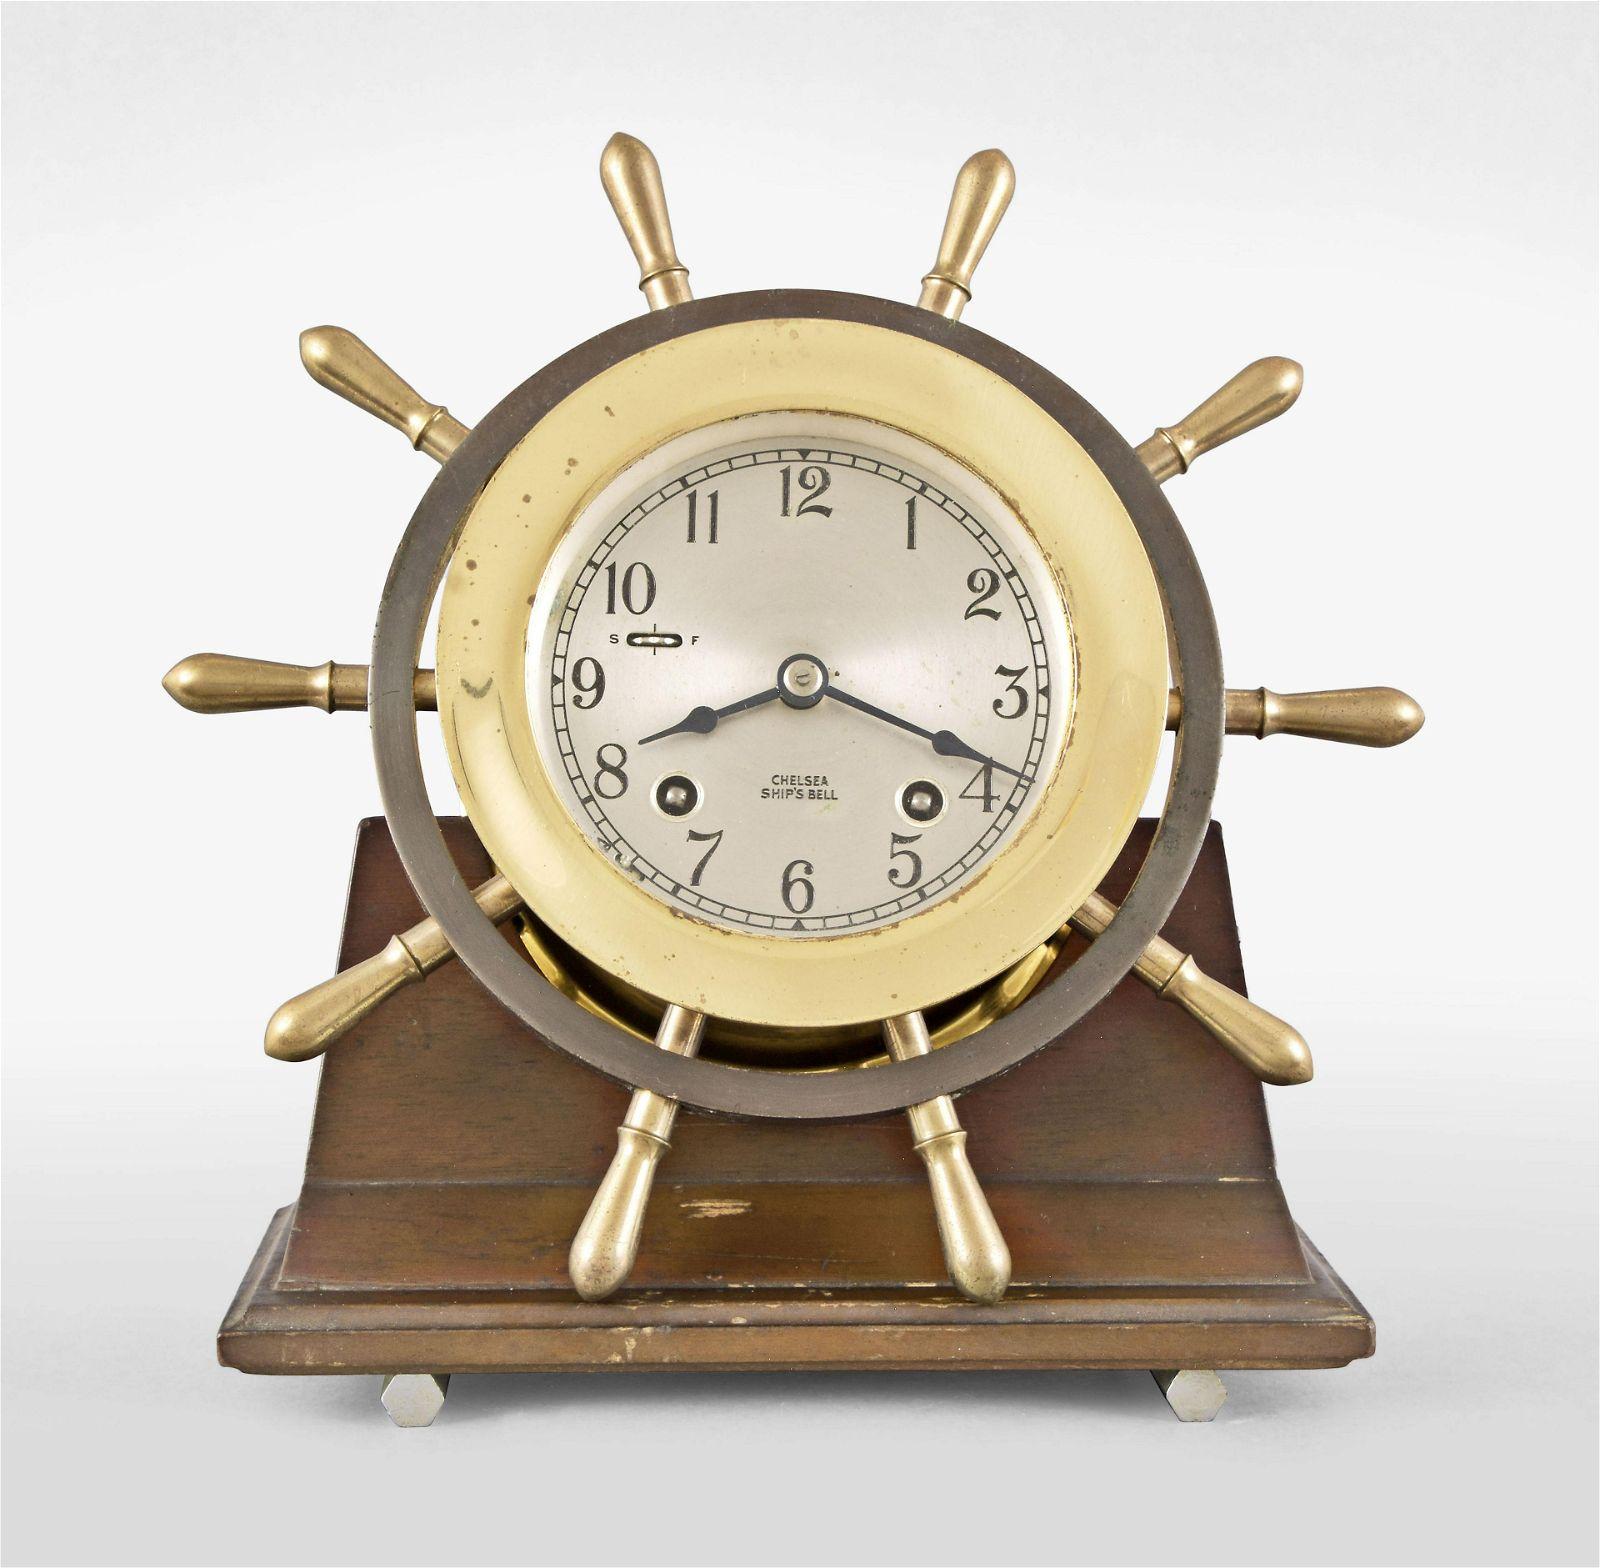 Chelsea Clock Co., Yacht Wheel ship's bell clock